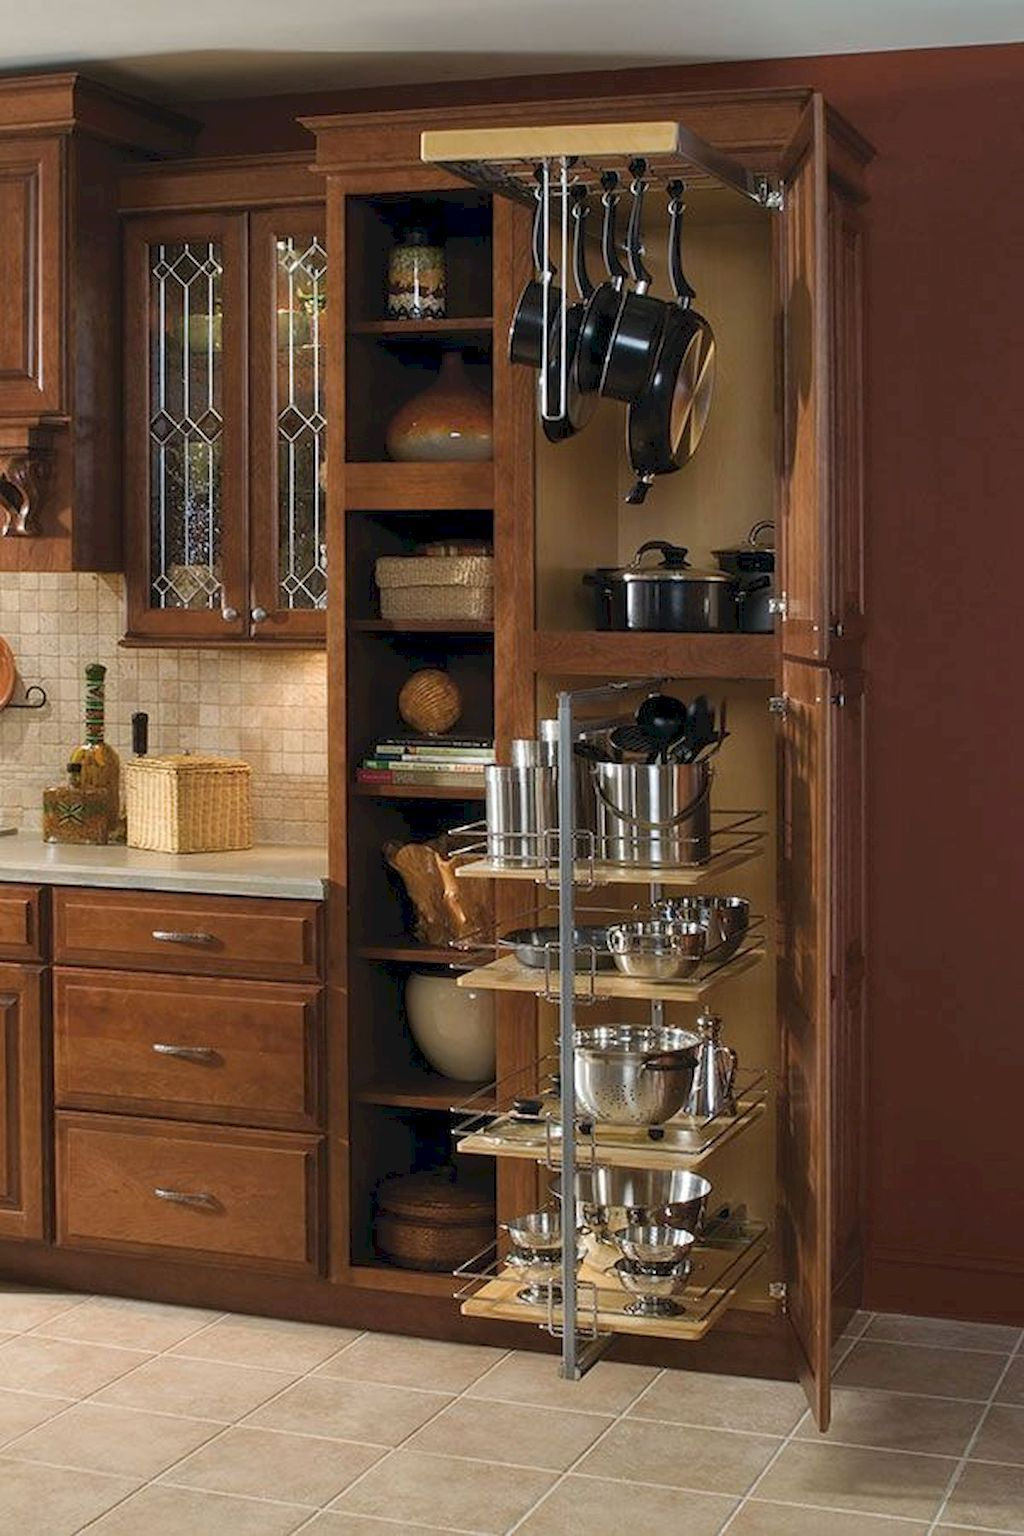 Wondrous Kitchen Cupboard Concepts Diy Kitchen Renovation Kitchen Cabinets Diy Kitchen Cabinets